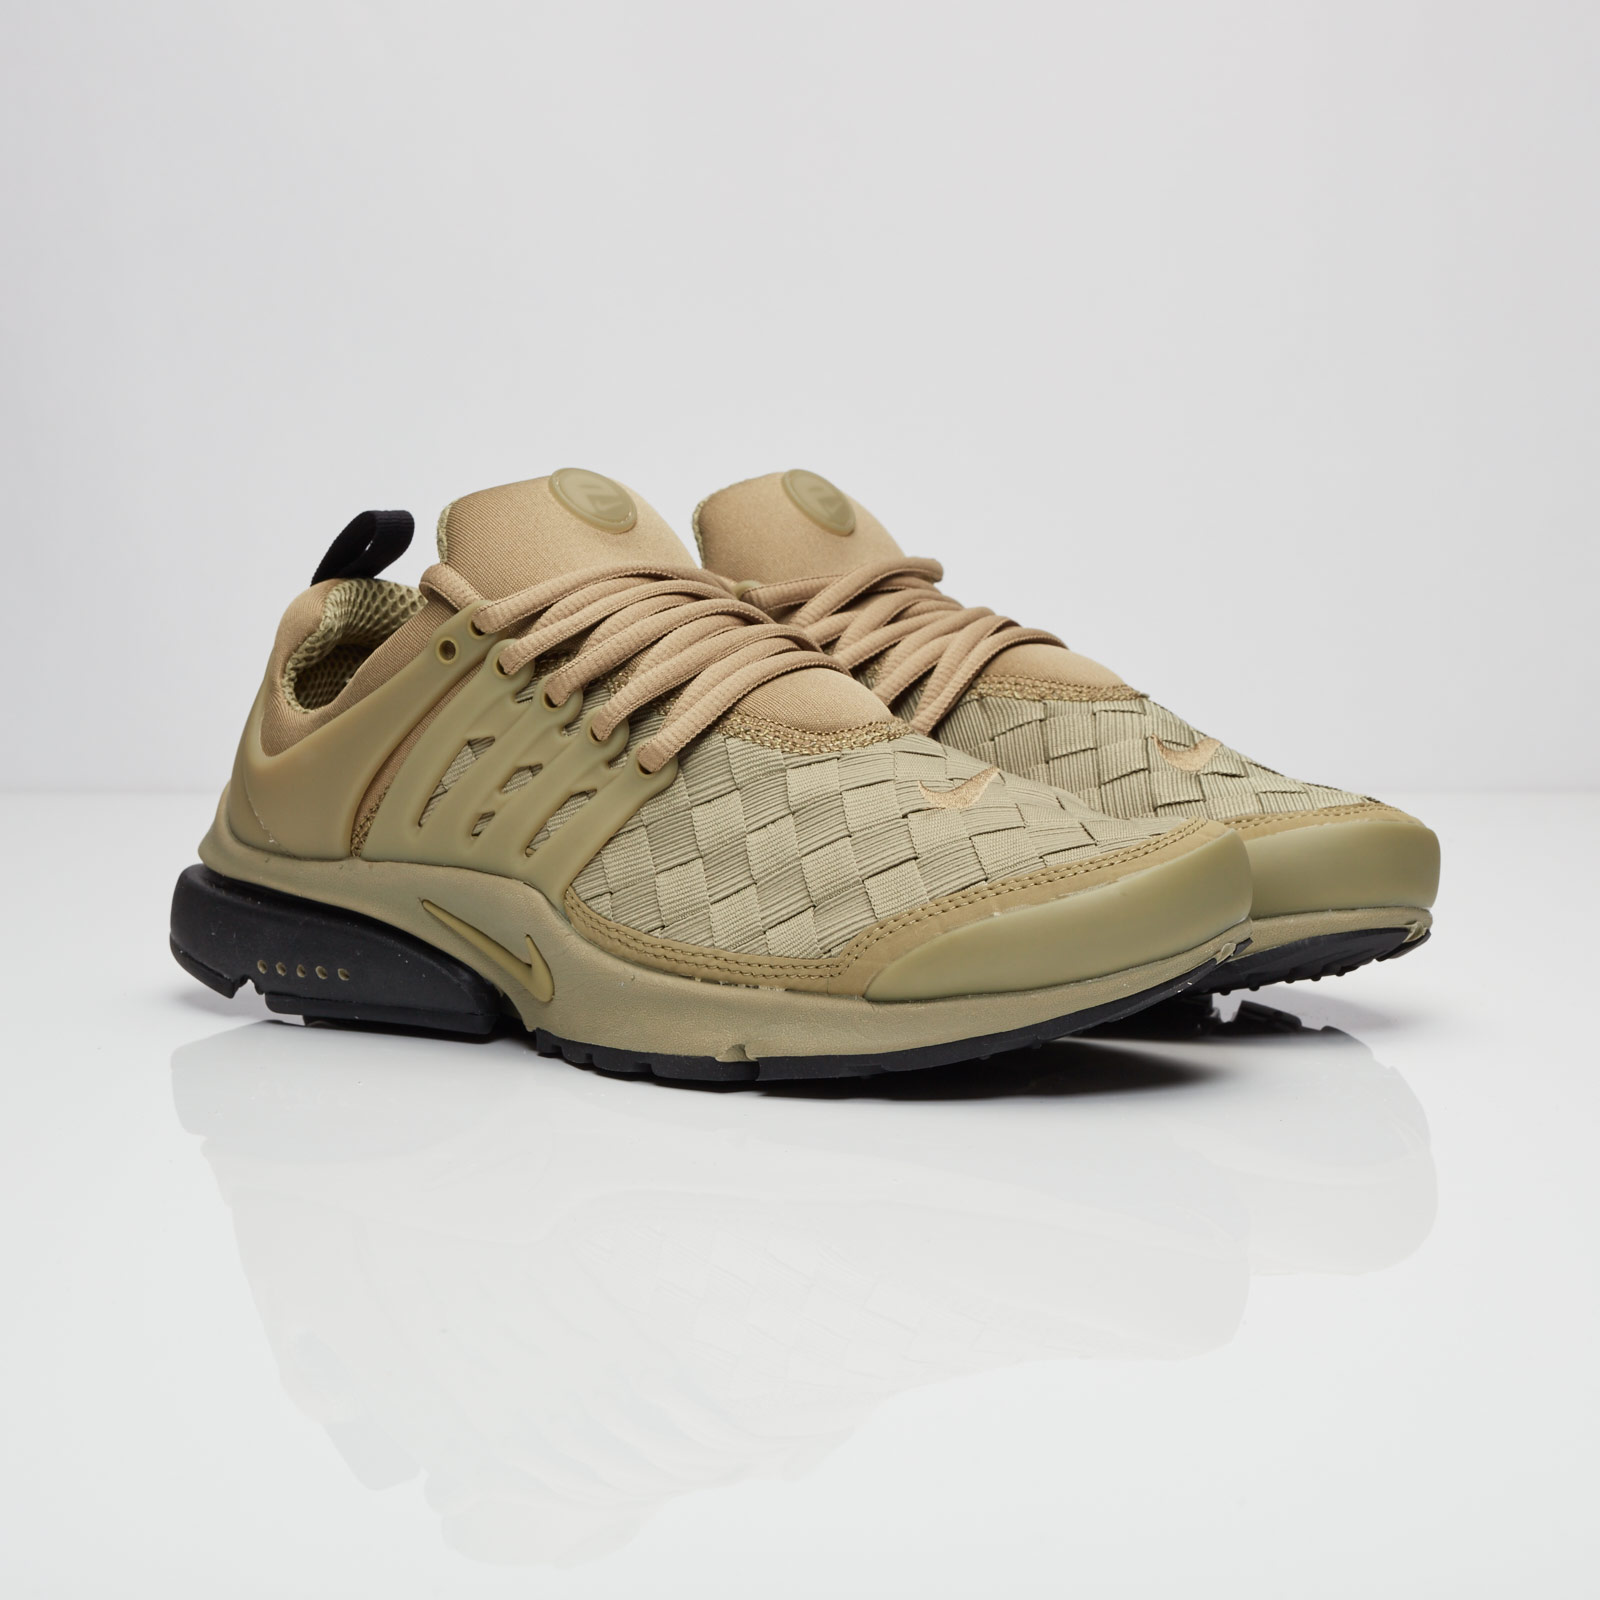 05eb67a0915b2 Nike Air Presto SE - 848186-200 - Sneakersnstuff | sneakers ...